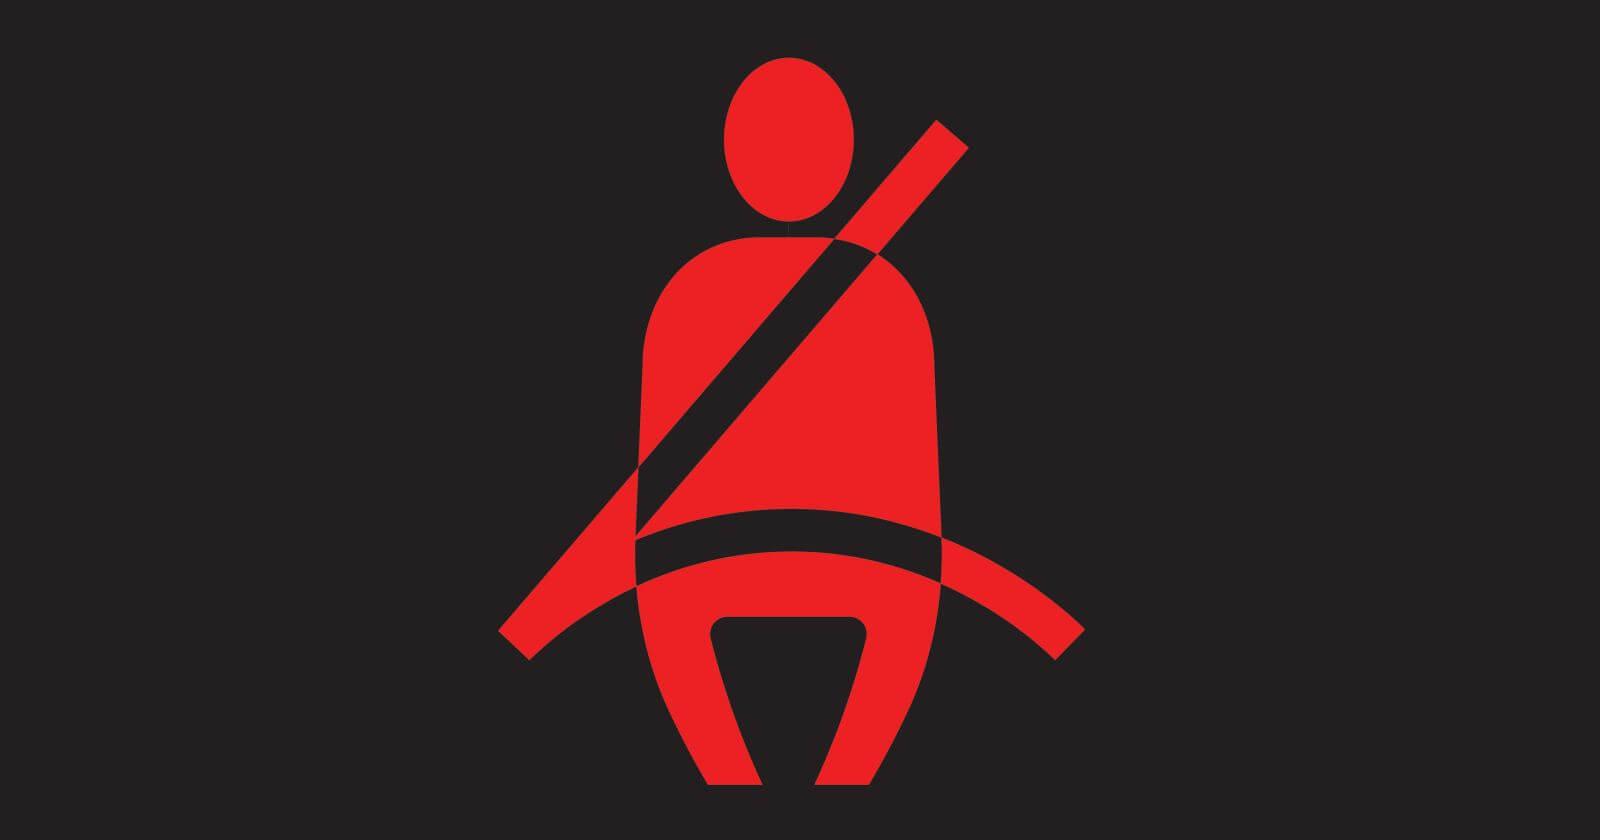 Car Dashboard Symbols - Seat Belt Reminder Warning Light